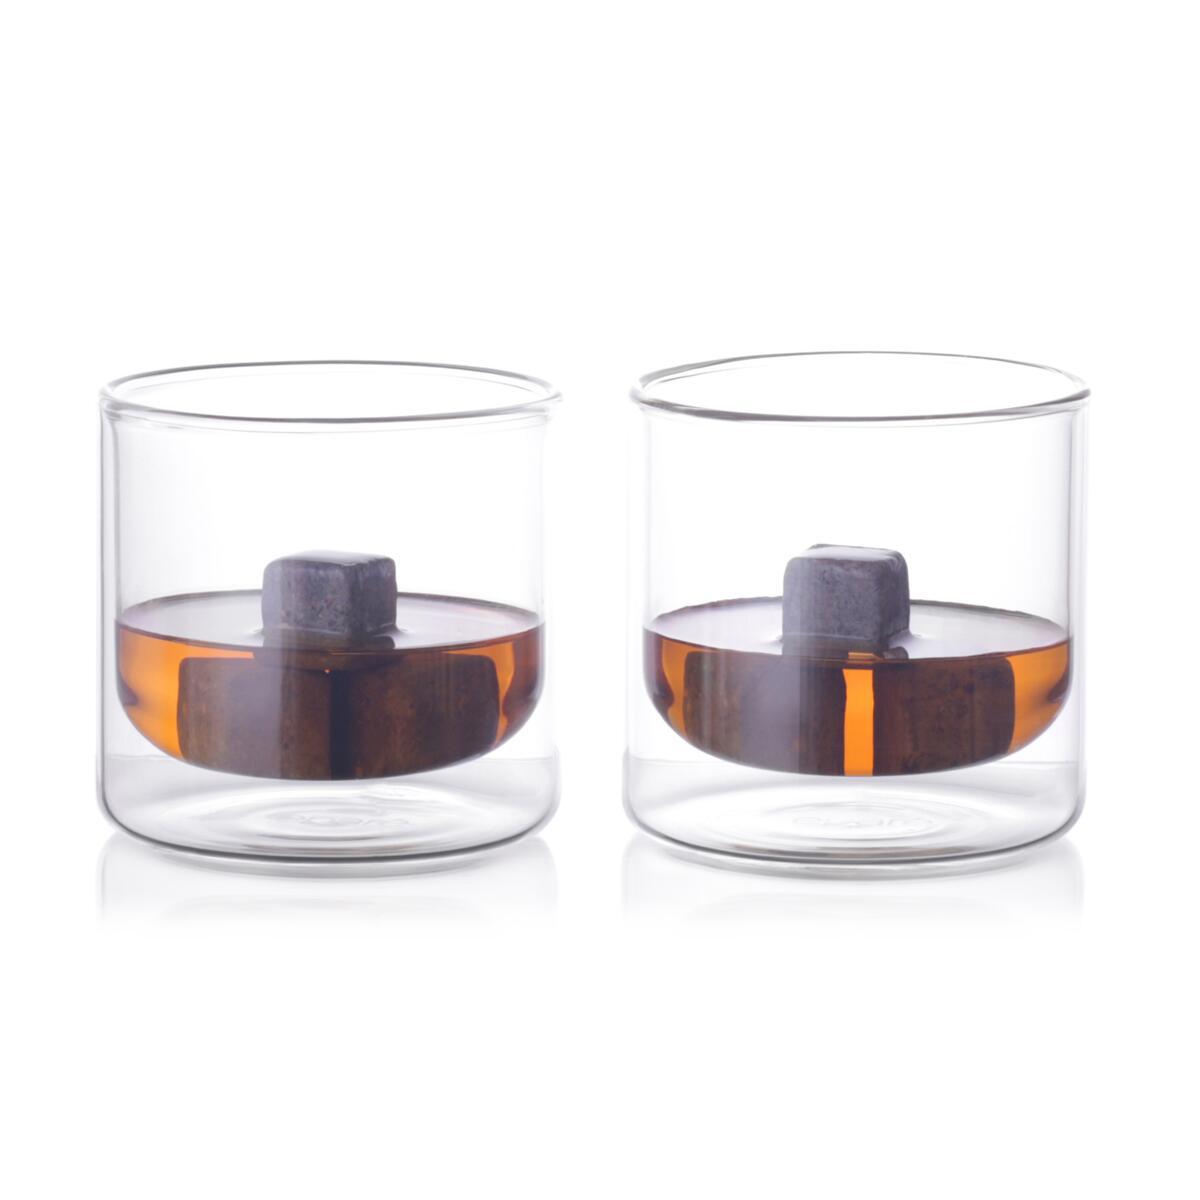 Eparé 9 oz Double-Wall Whiskey Glass (Set of 2)